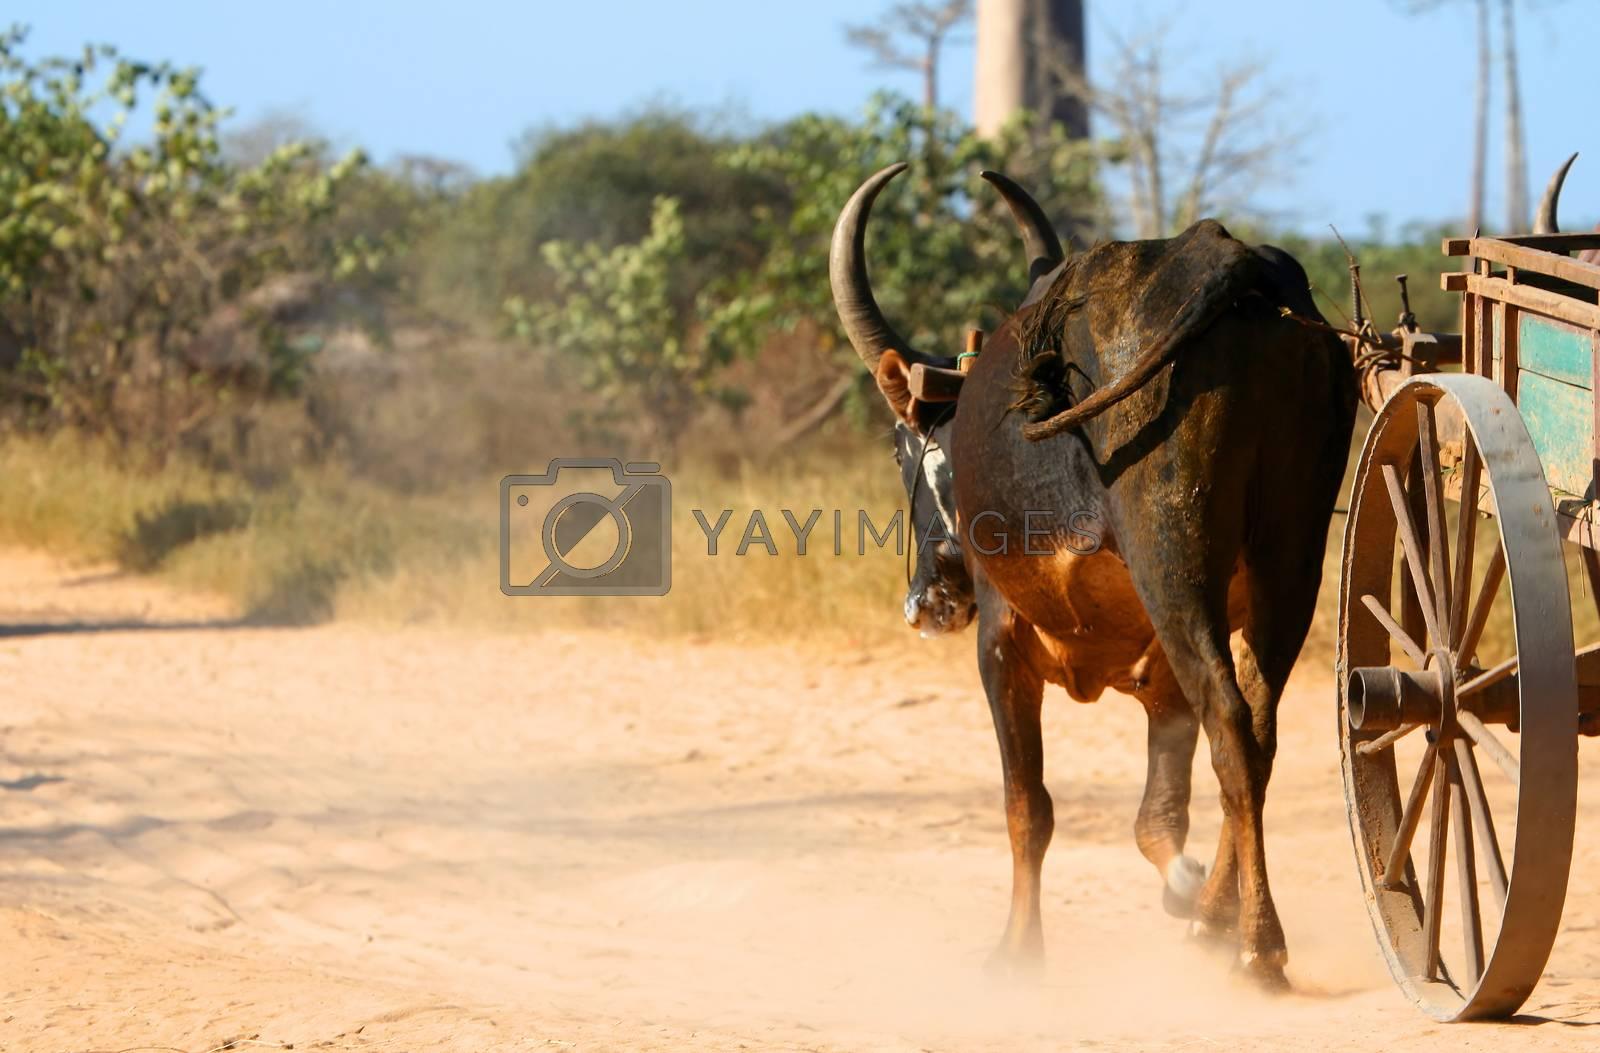 Zebu cart on the sandy road going through the Avenida the Baobab near Morondava in Madagascar